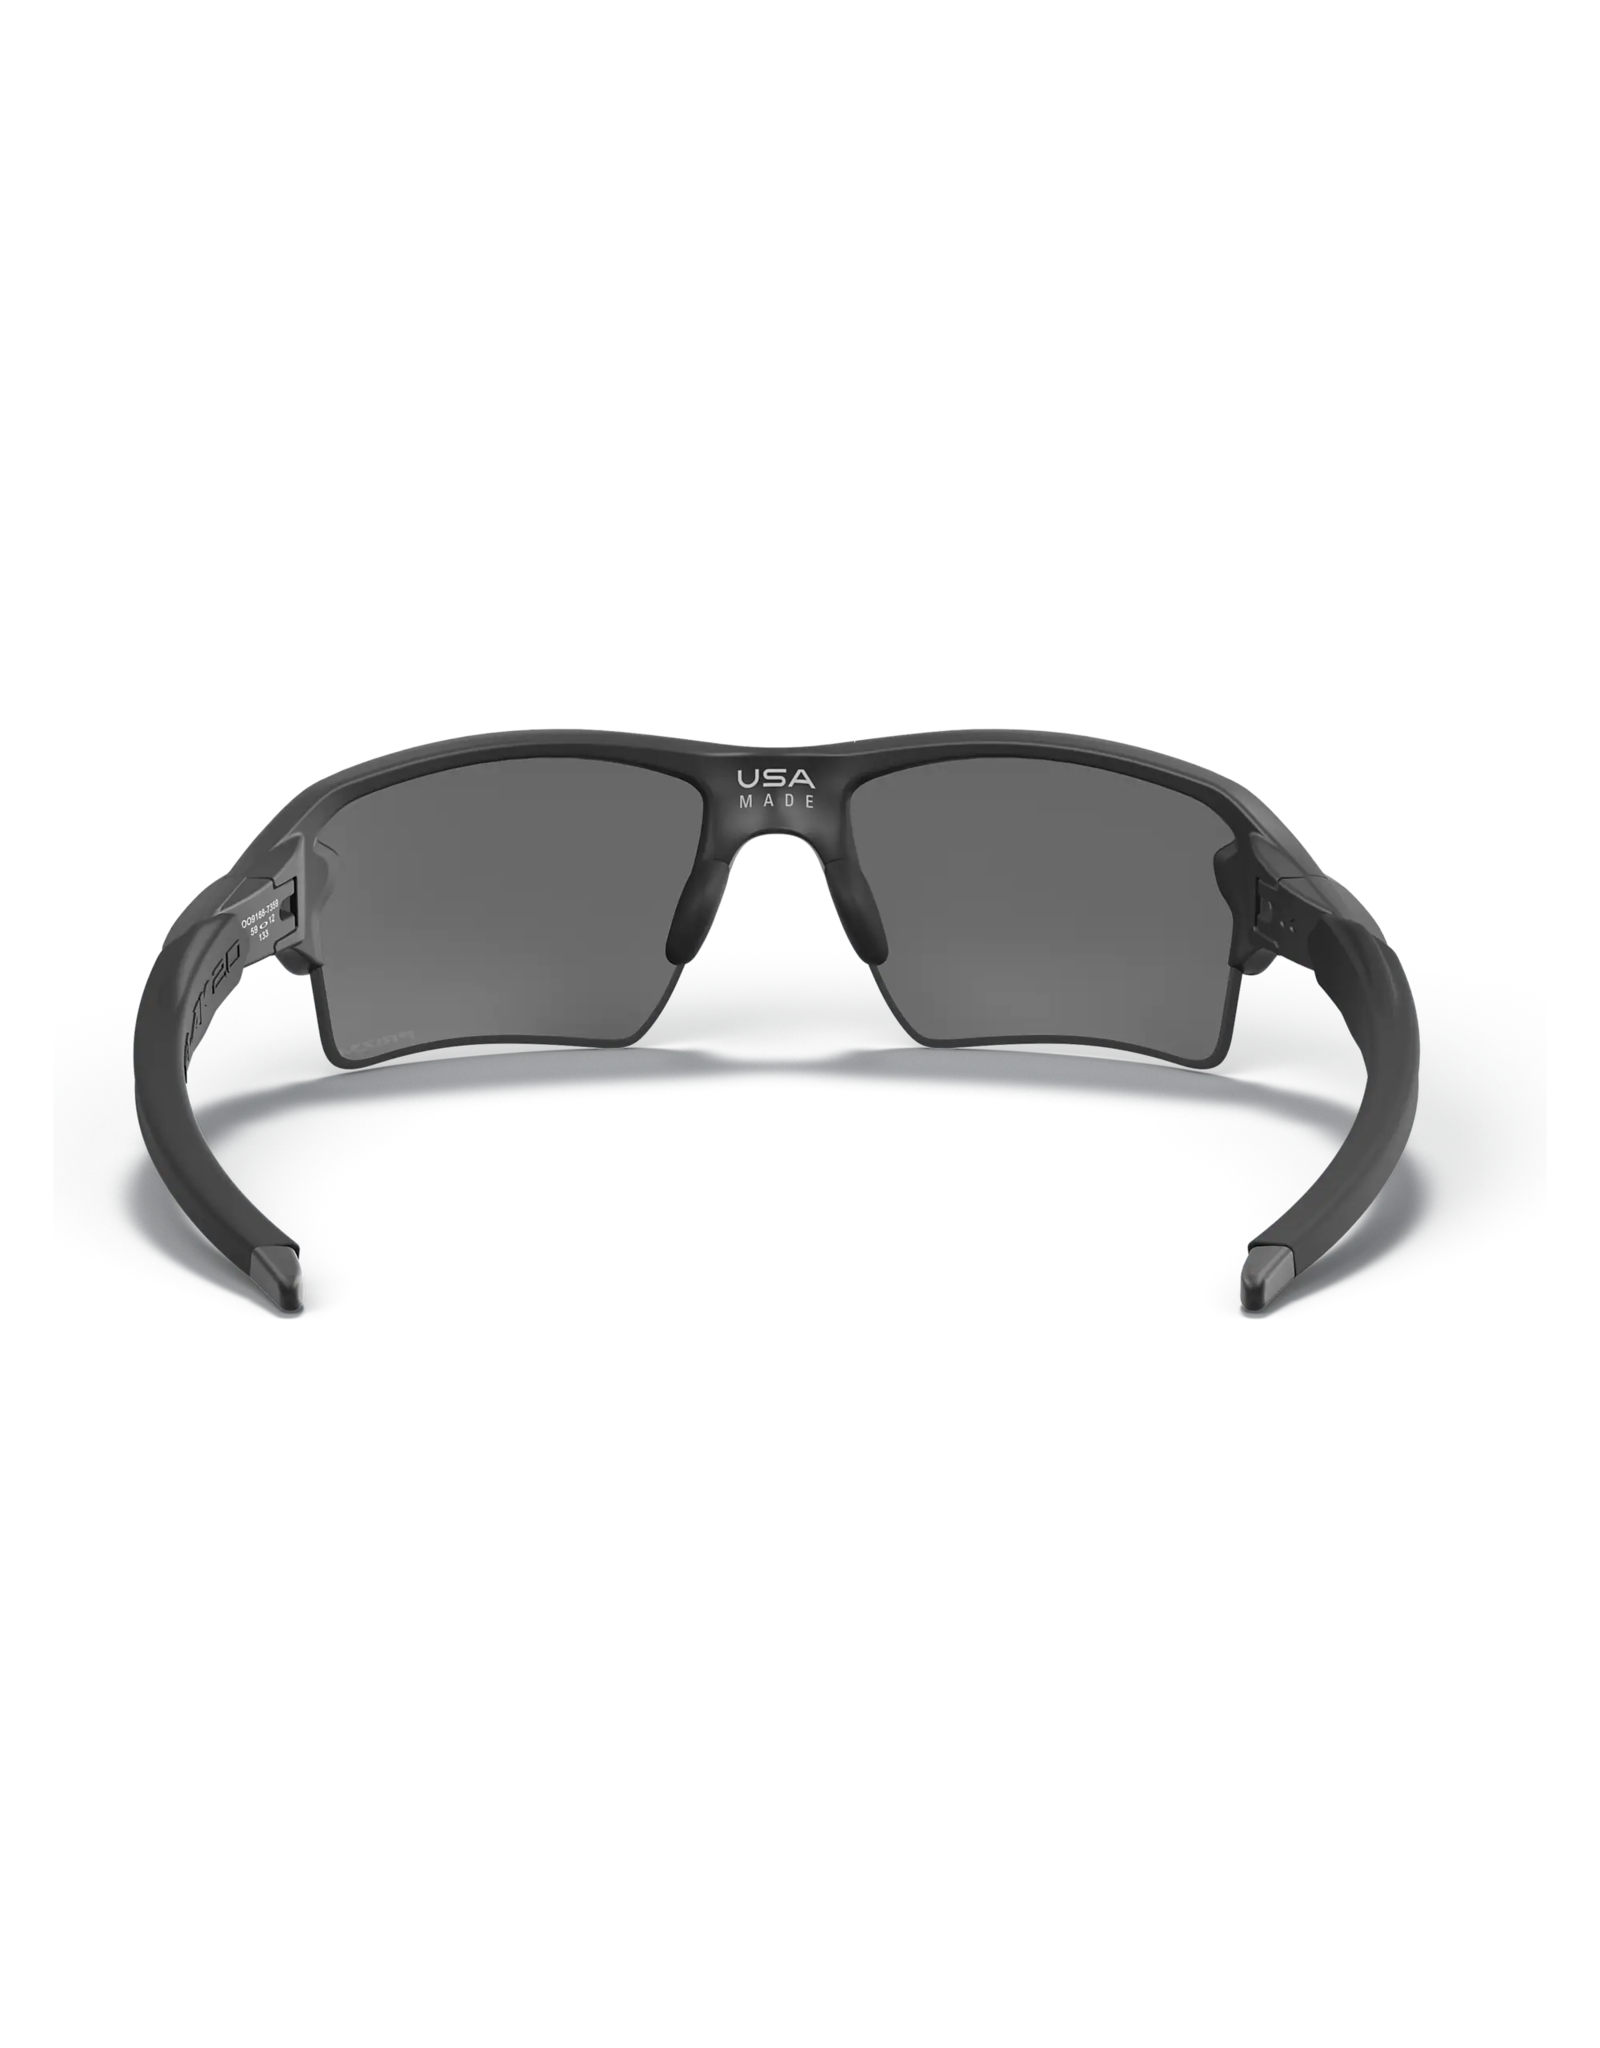 OAKLEY Oakley Flak 2.0 XL matte black prizm black iridium sun glasses